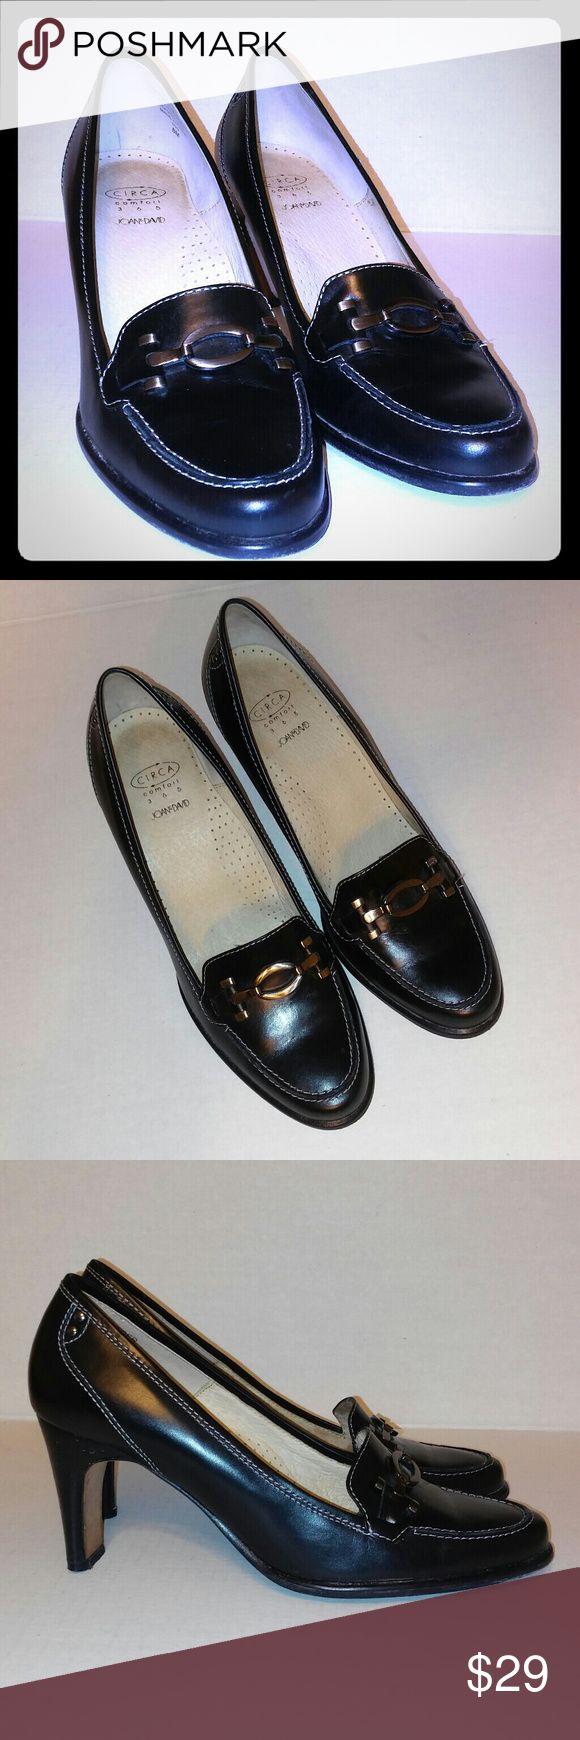 "JOAN & DAVID Circa Comfort 365 Leather Loafers JOAN & DAVID Circa Comfort 365 Leather Black High Heel Loafers   Shoe Size & Measurements:  Sizing: Women 8 M Width: Medium 3.25"" at the widest?  9.5"" toe to heel length  3"" heel Joan & David Shoes Heels"